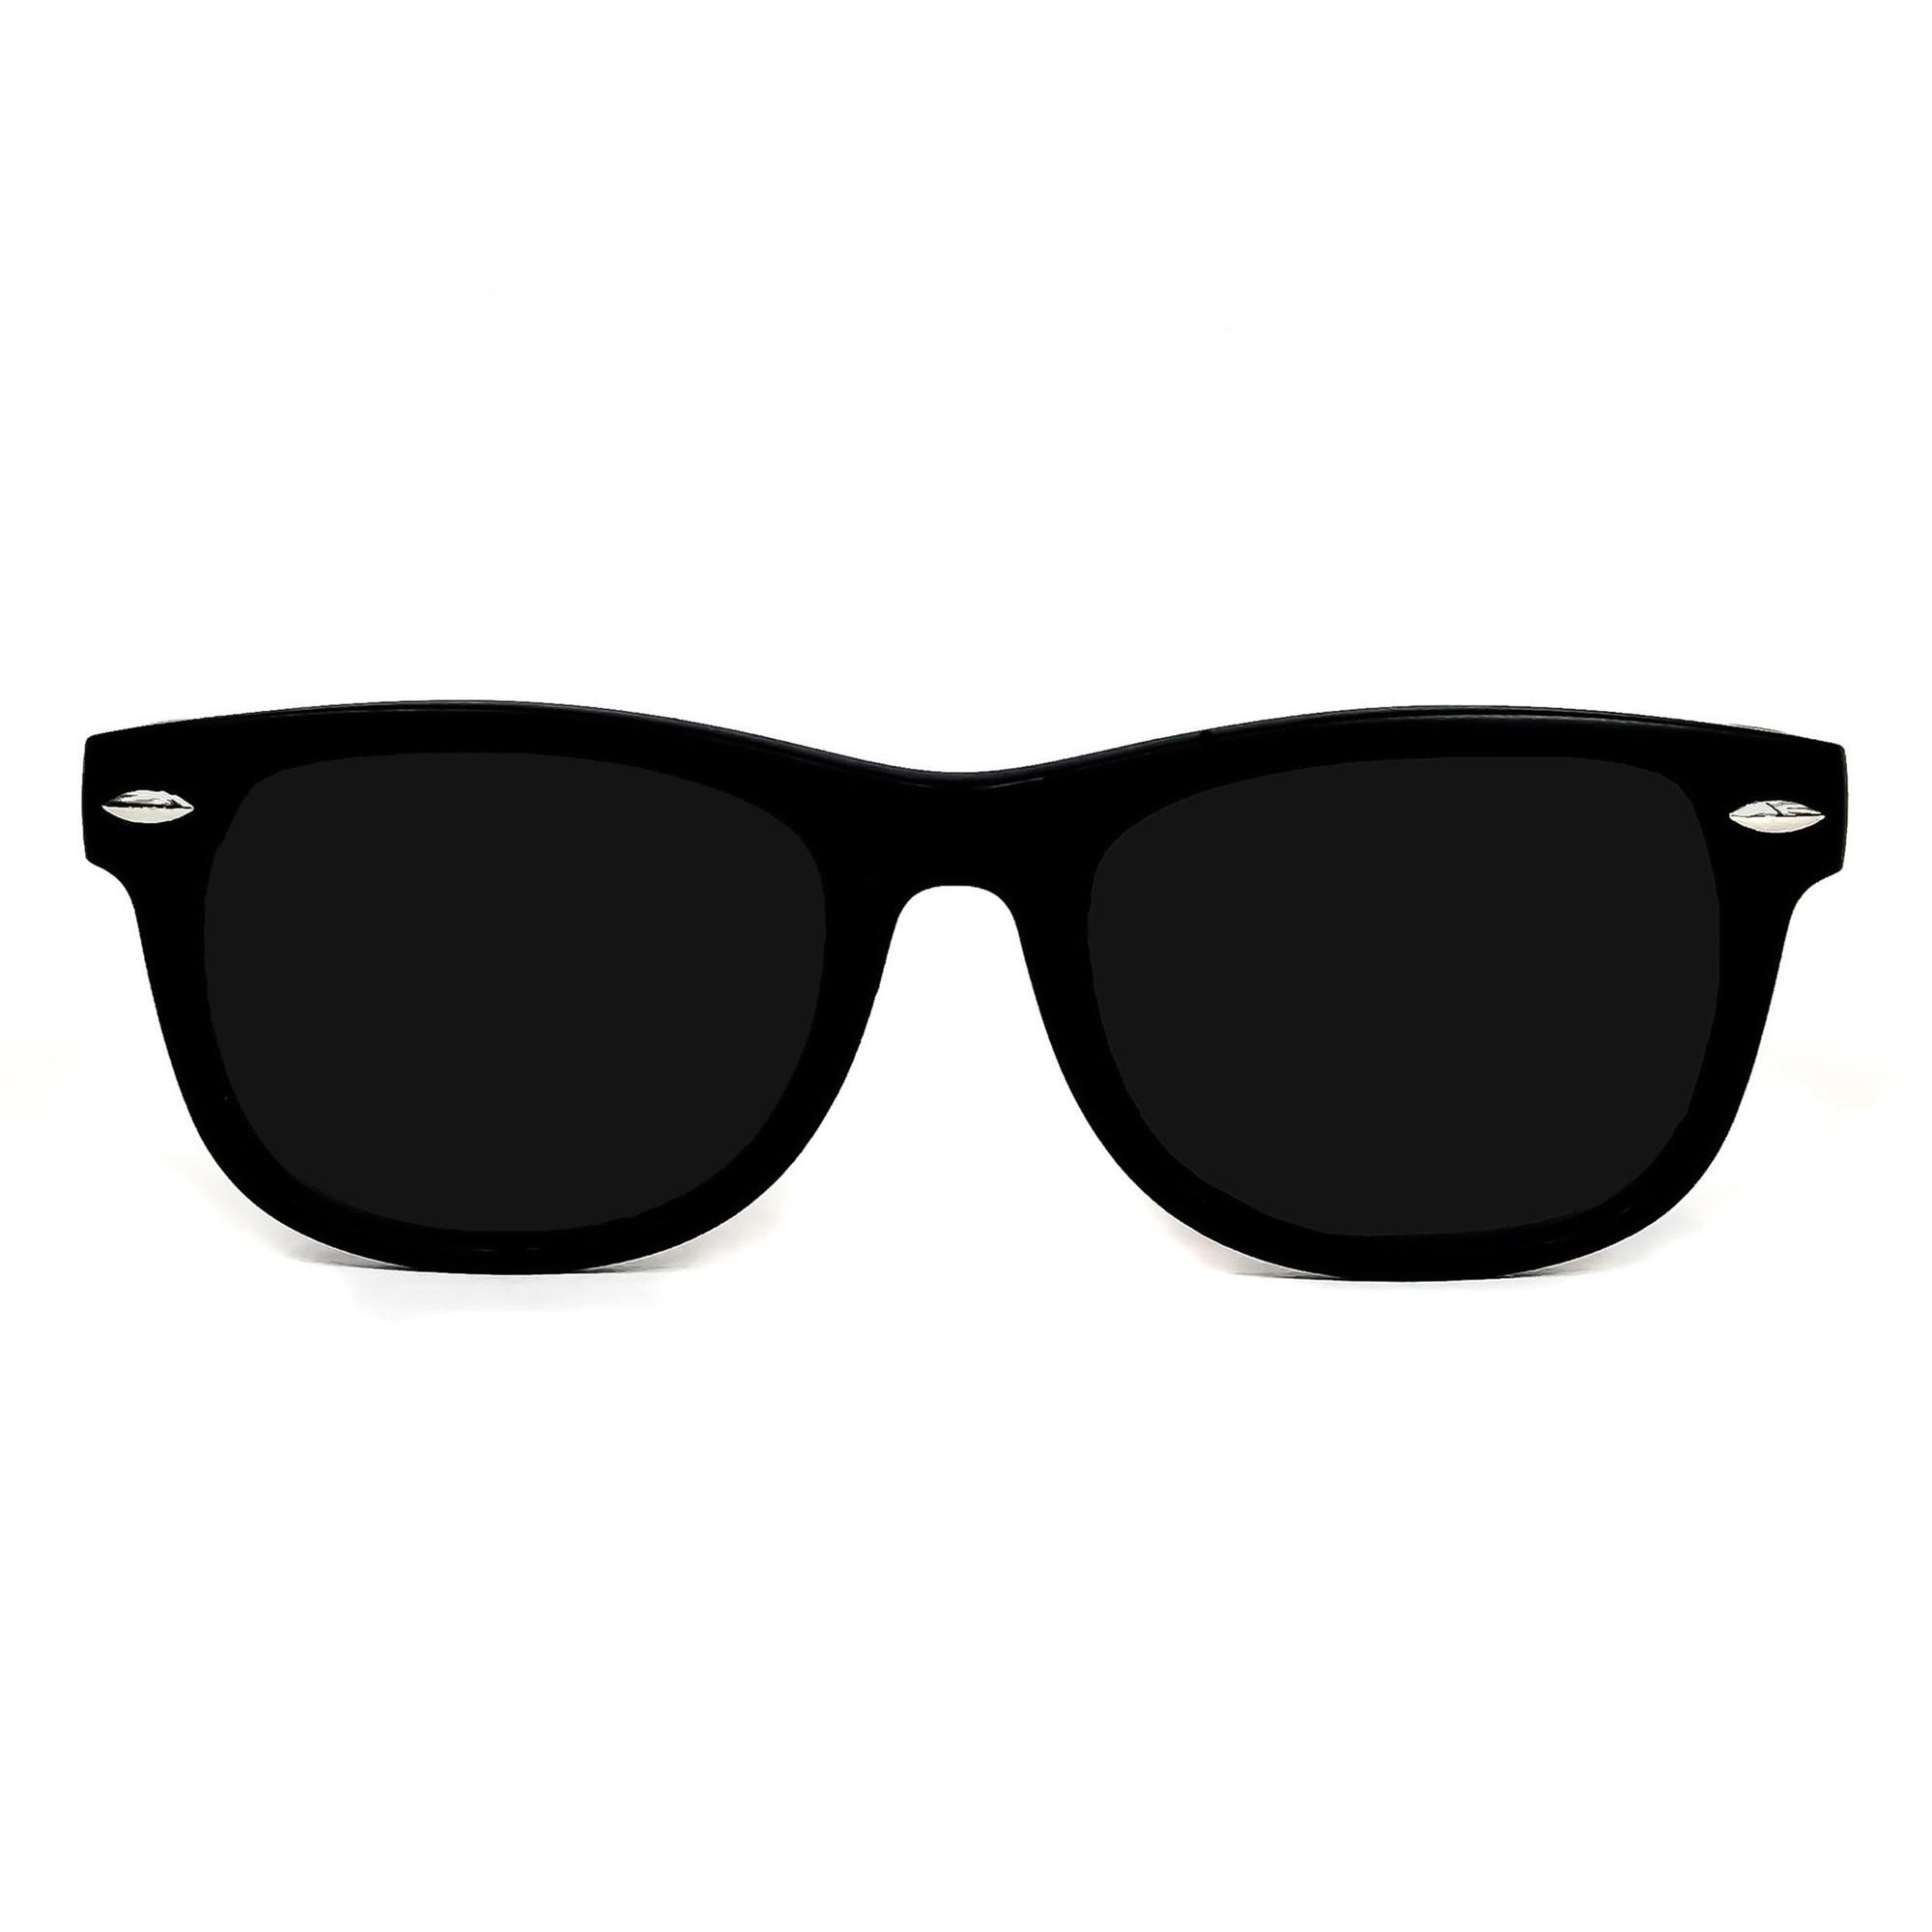 Babyfied Apparel Classic Black Sunglasses 6-24mos